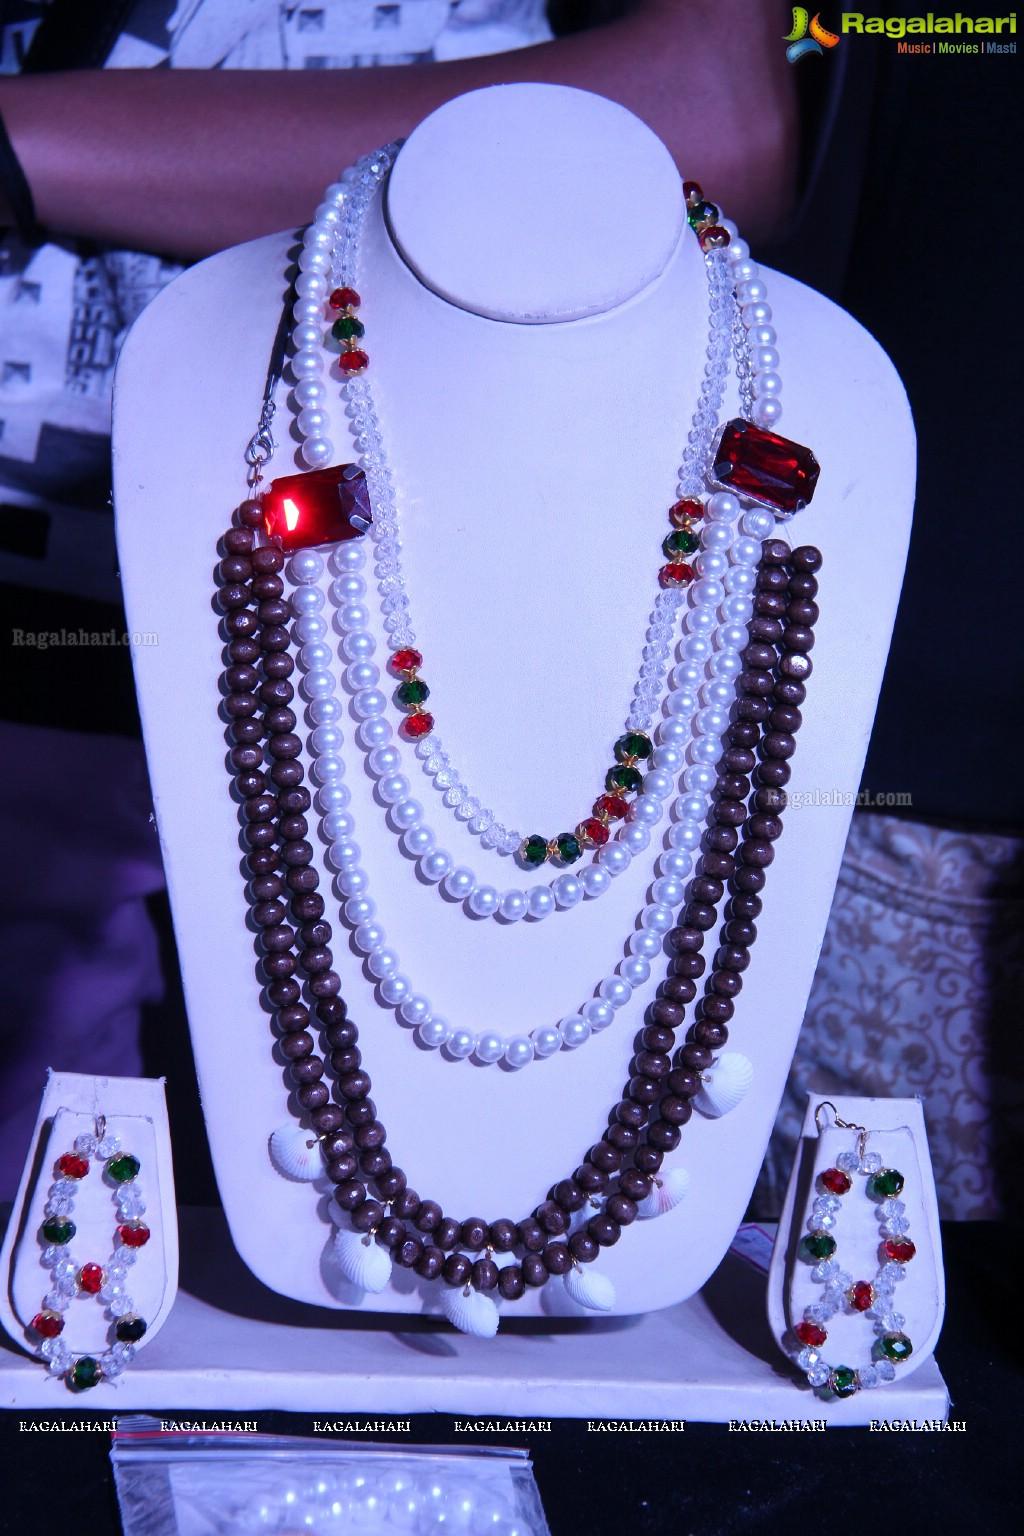 Photos - Hamstech Jewellery Design Show and Exhibition at Birla